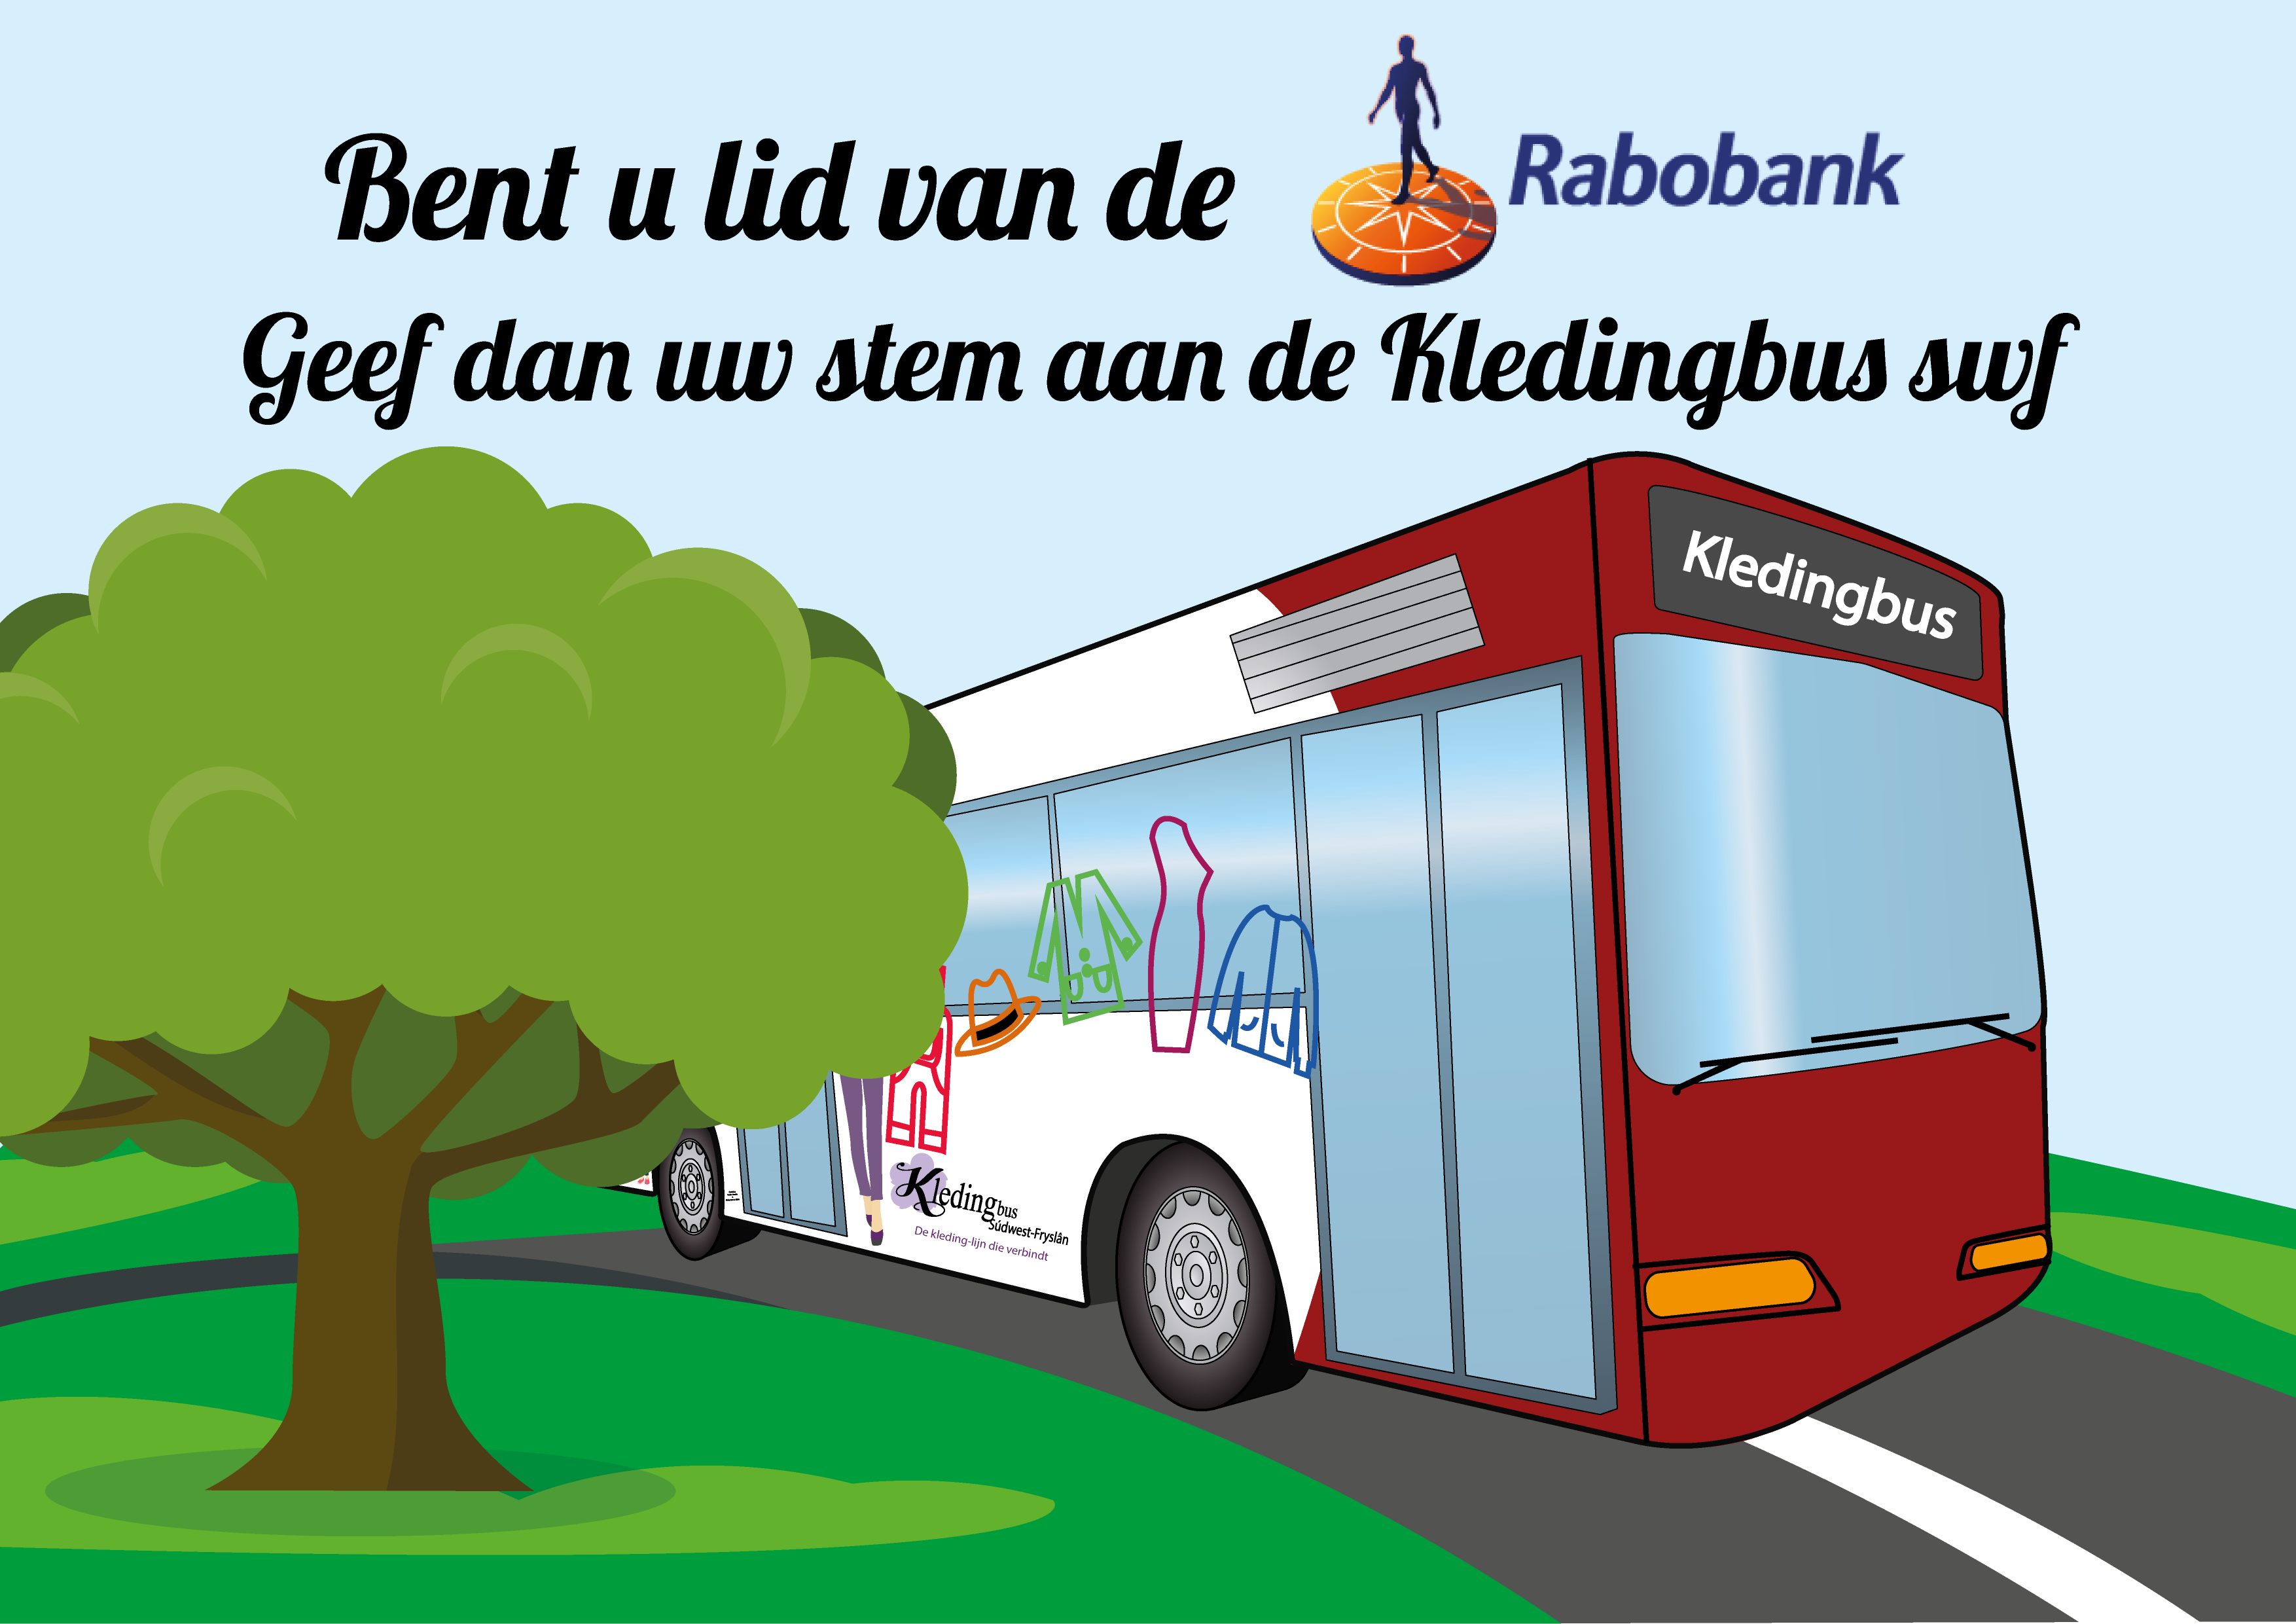 bus facebok rabobankk_Tekengebied 1